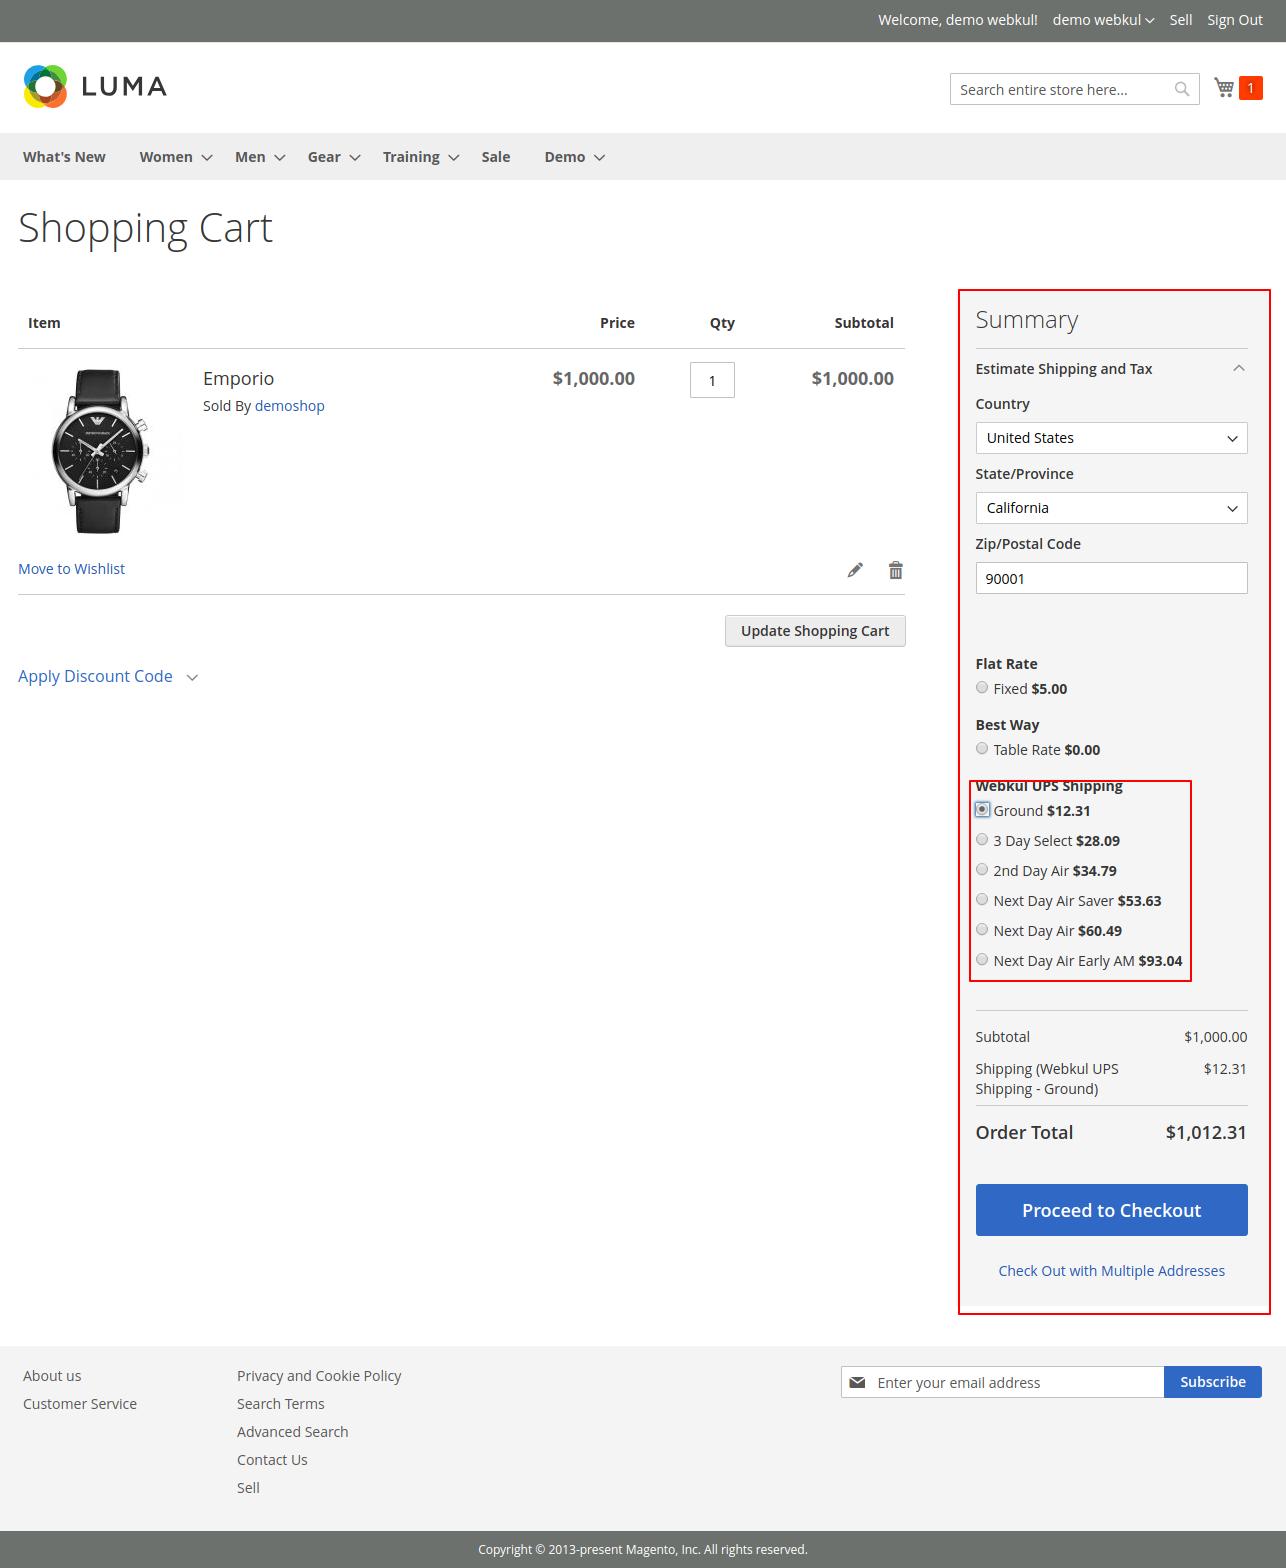 webkul-magento2-ups-shipping-shopping-cart.png